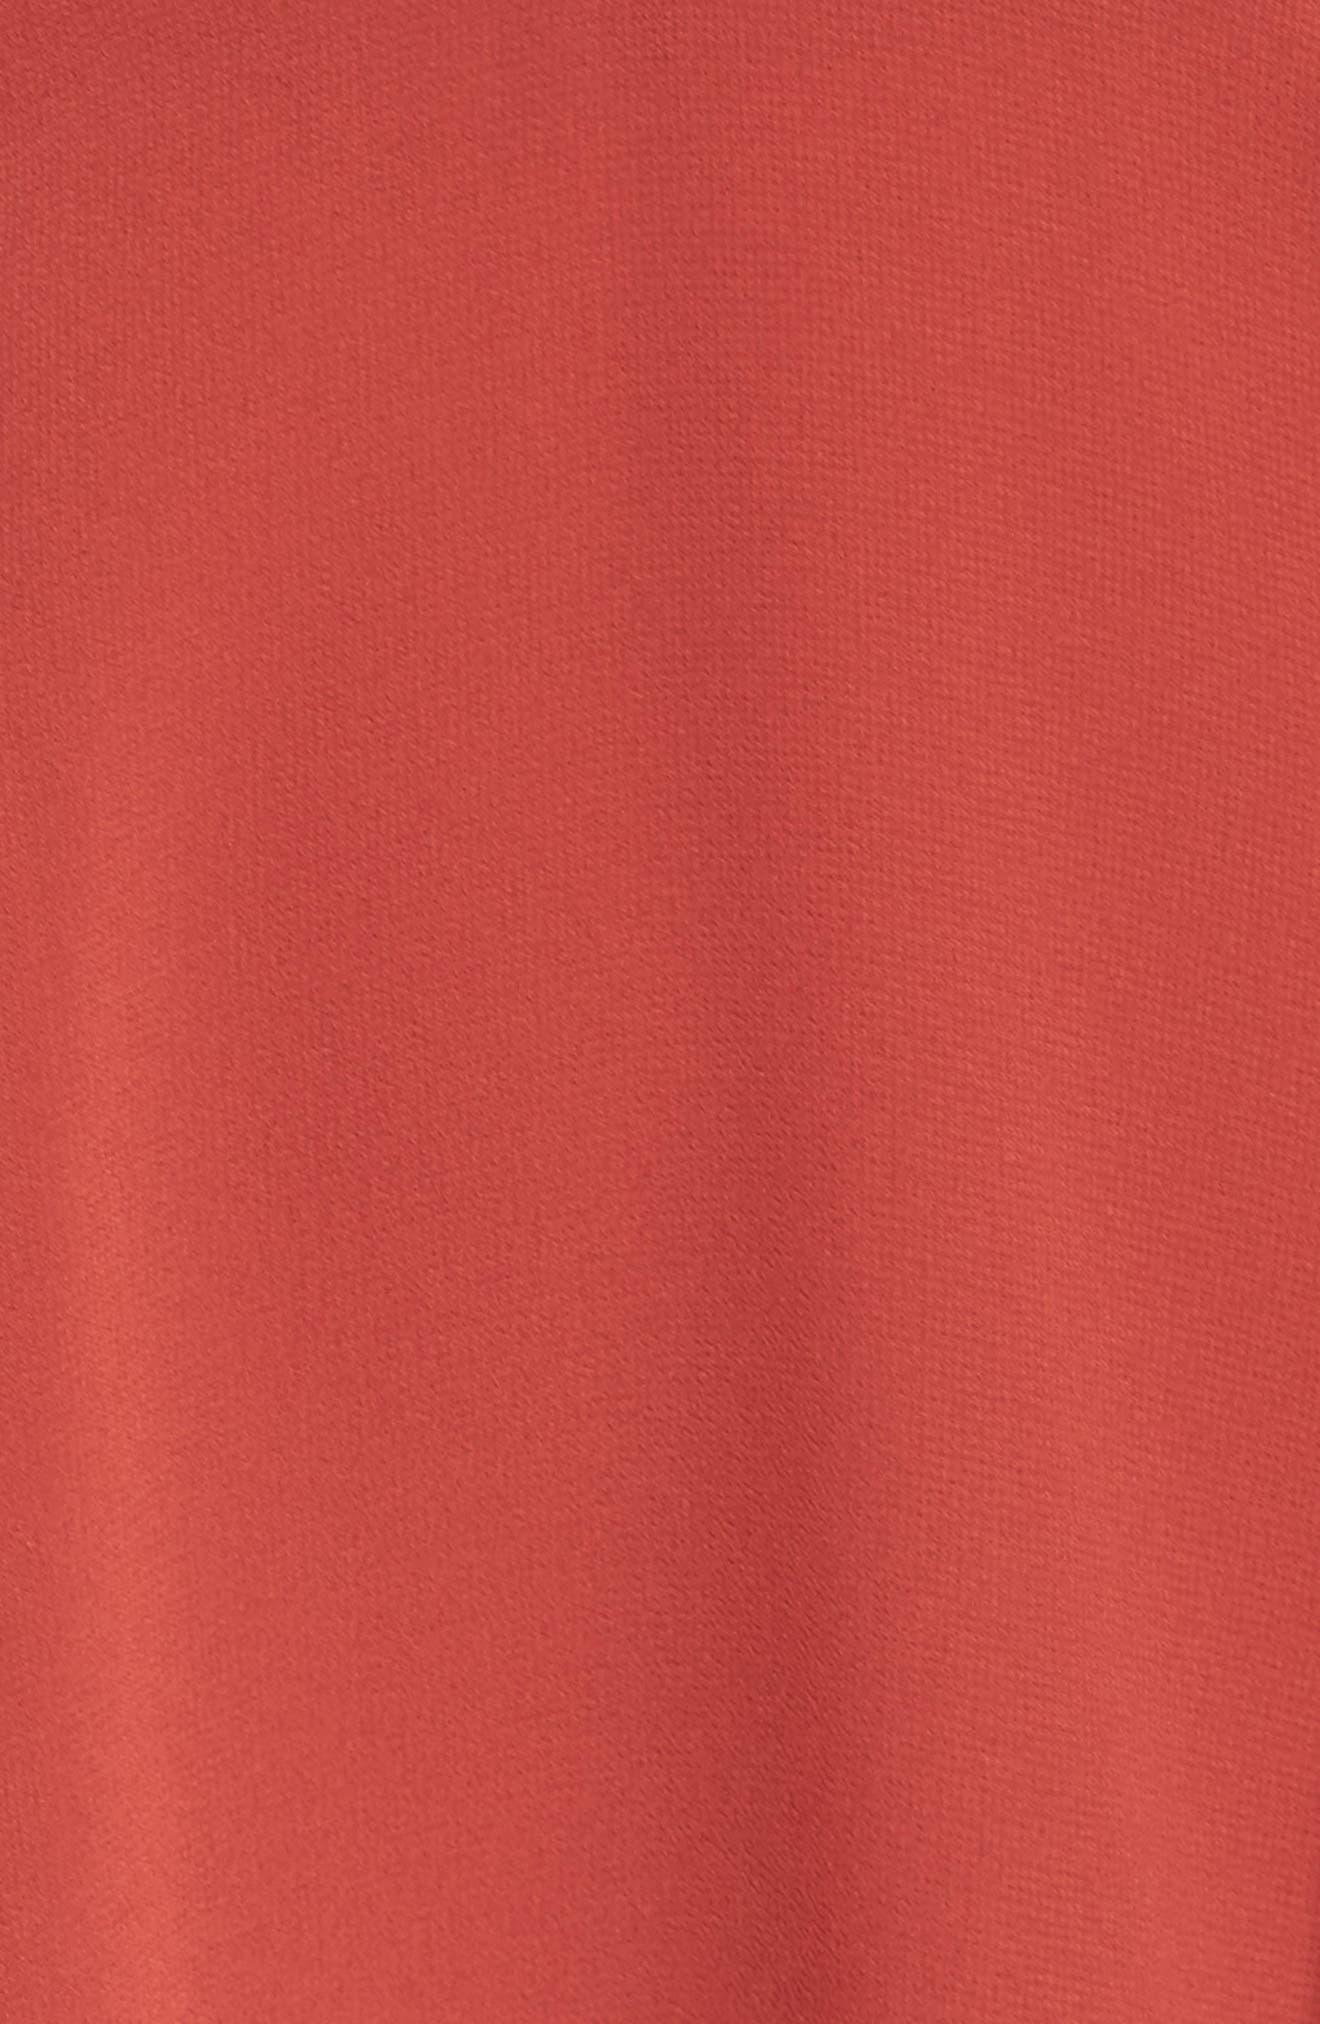 El Cid Tie Front Minidress,                             Alternate thumbnail 5, color,                             Rust